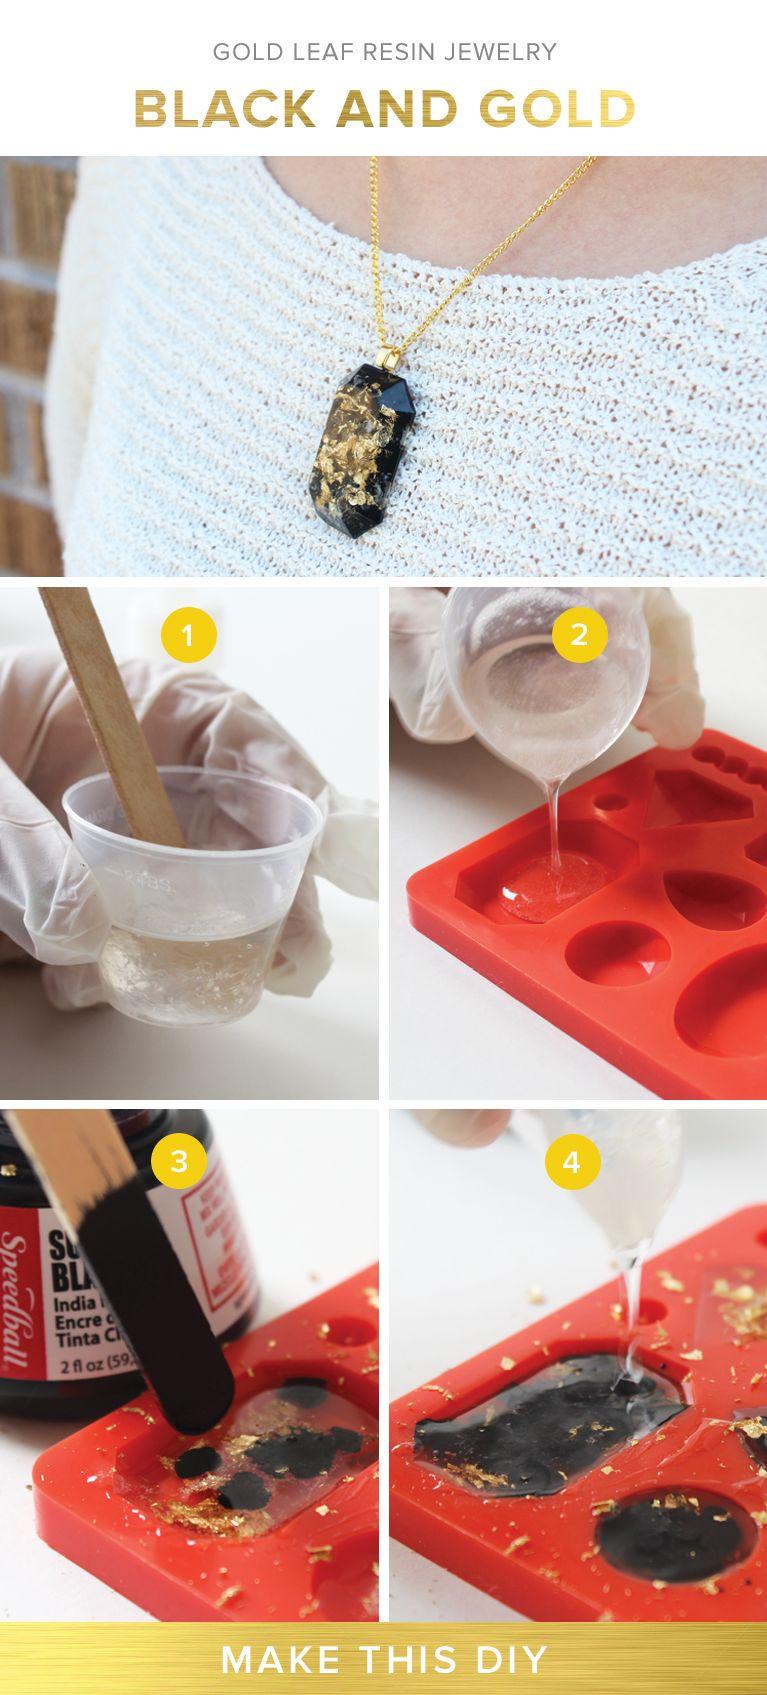 Create stunning jewelry with this DIY resin kit DIY